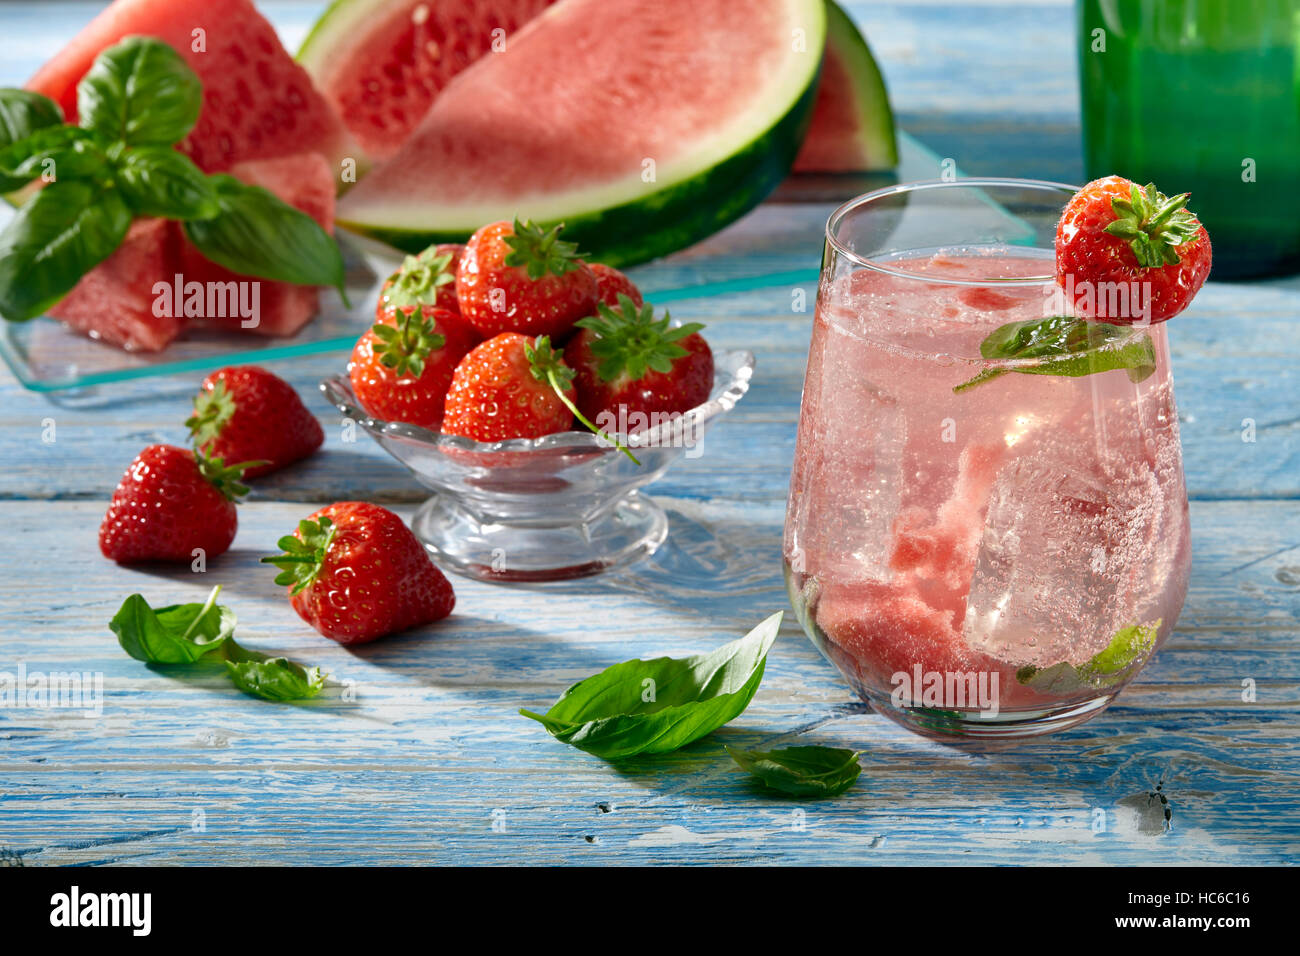 Watermelon aqua fresca beverage - Stock Image